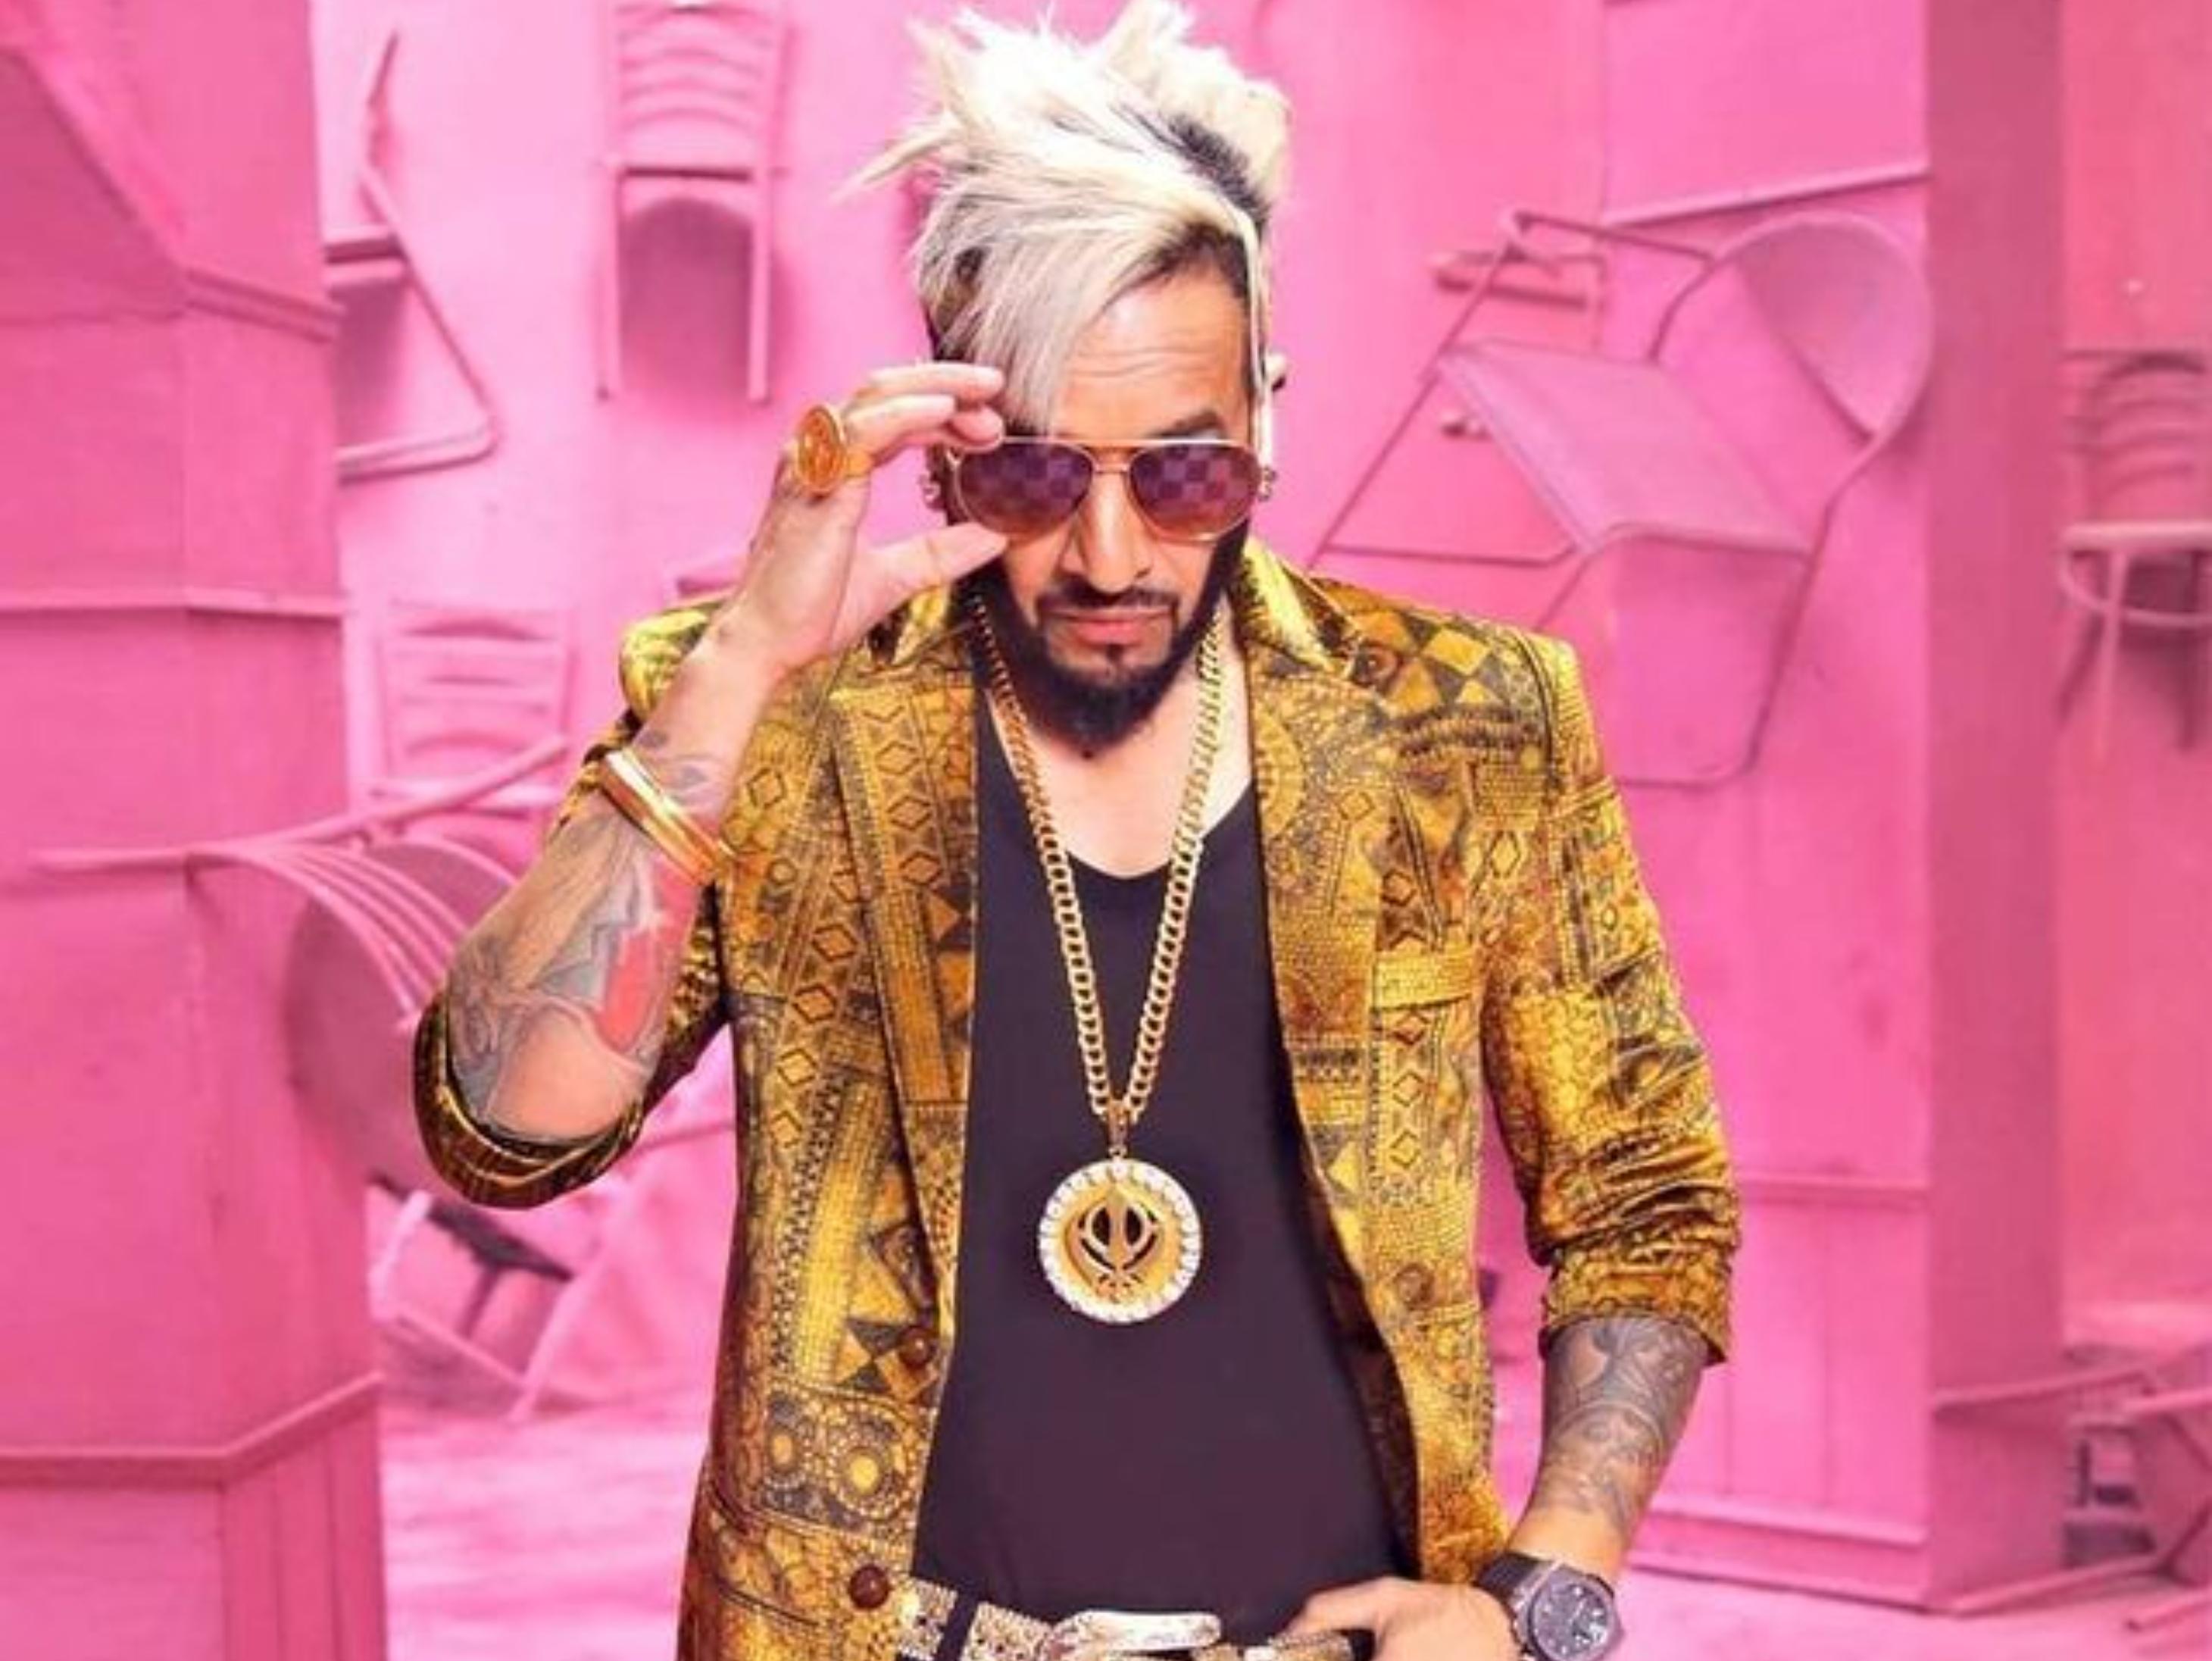 Punjabi rapper songwriter Jazzy B Twitter account geo restricted on legal request by Indian Government   किसान आंदोलन के समर्थक रहे पंजाबी सिंगर जैजी बी का ट्विटर अकाउंट हुआ जियो रिस्ट्रेक्टेड